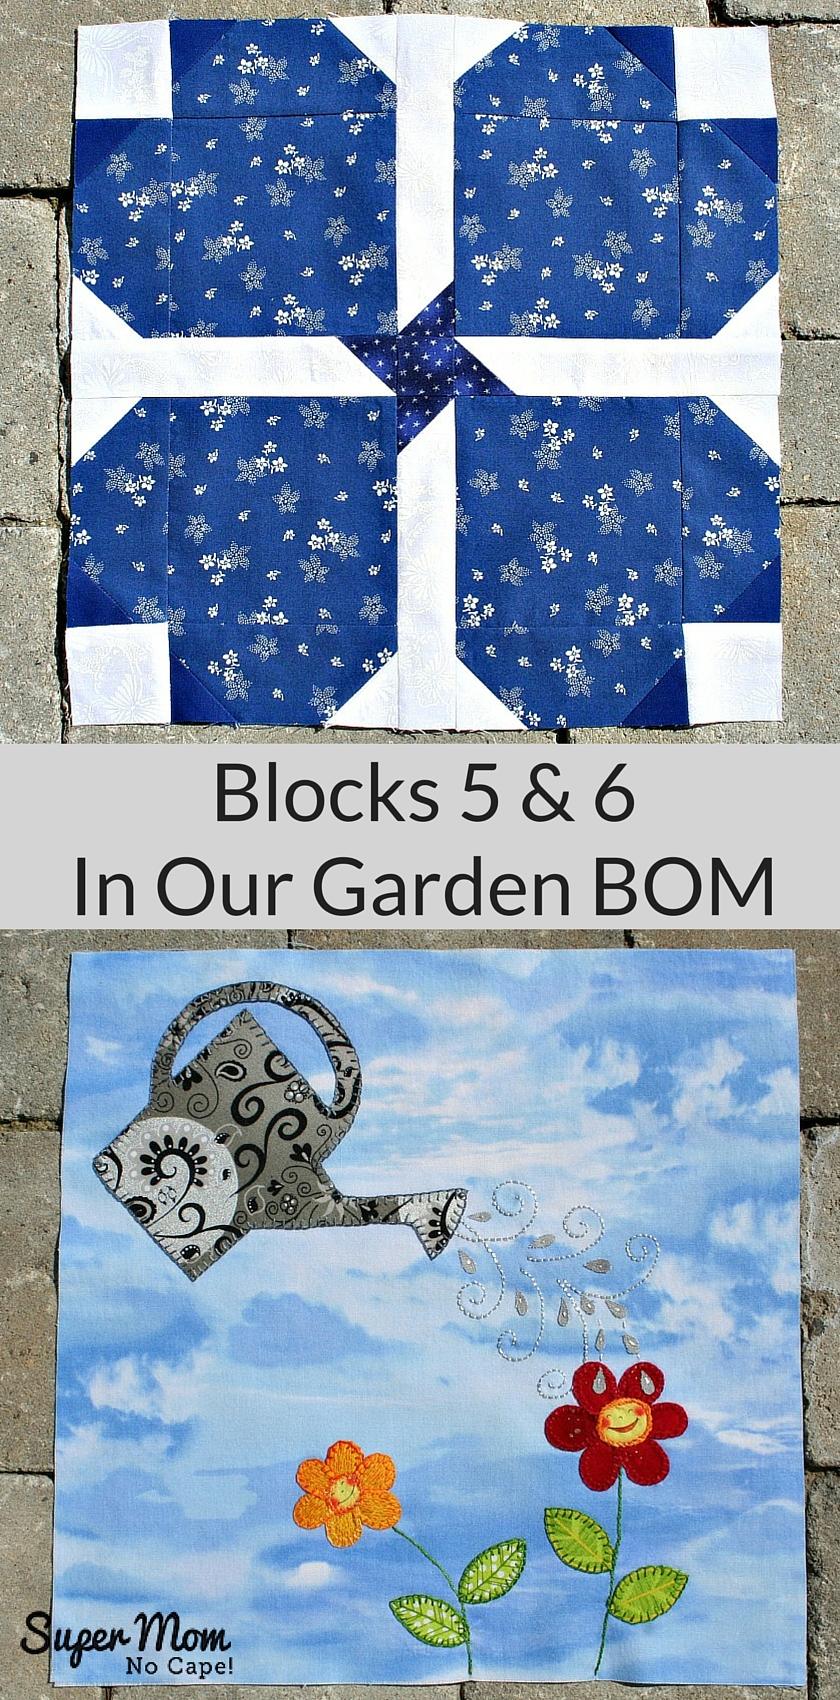 Blocks 5 & 6 In Our Garden BOM